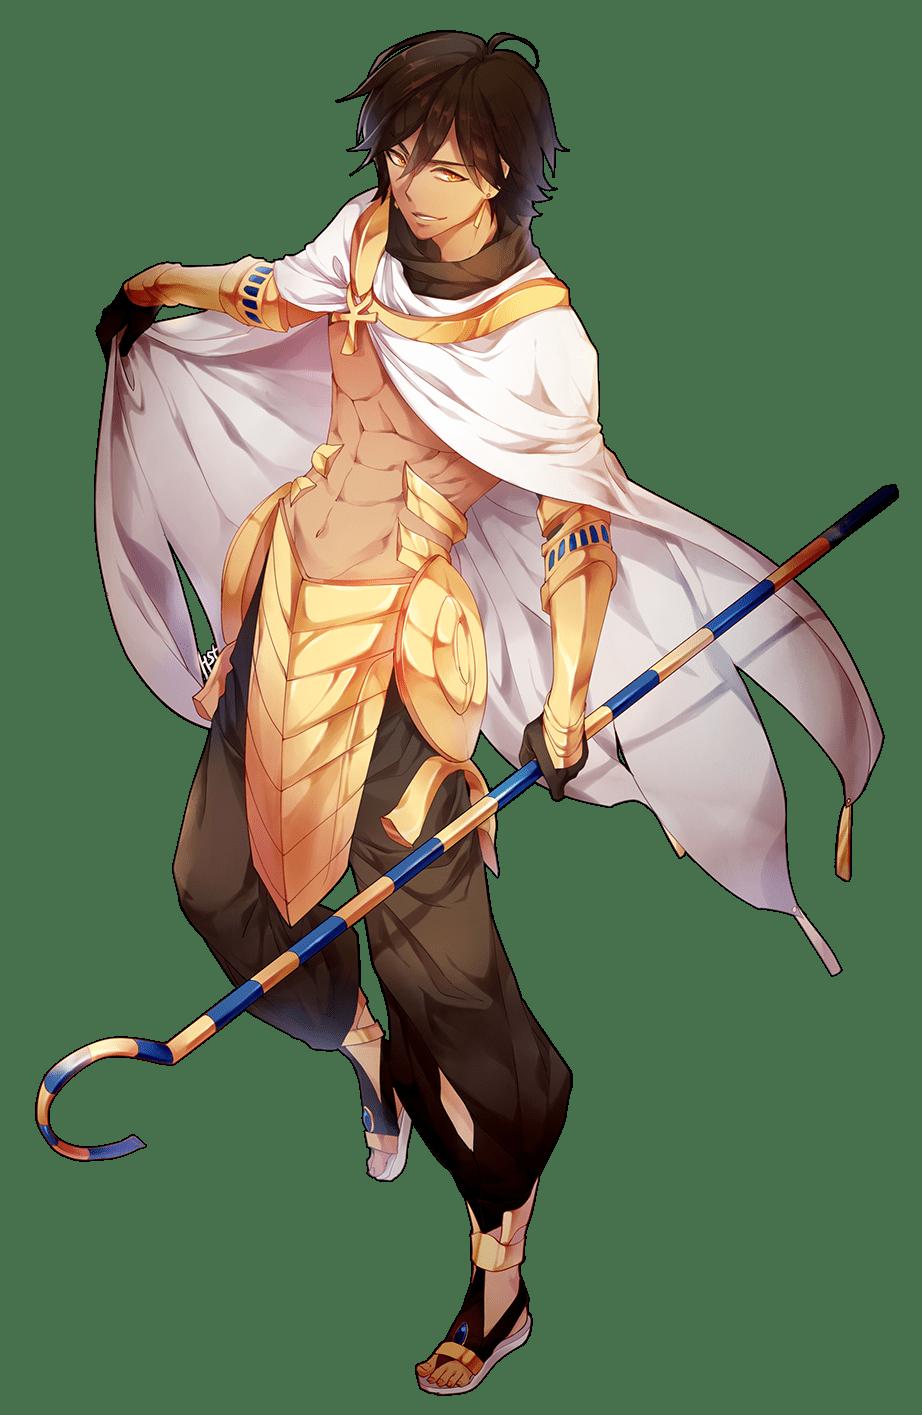 1boy ankh armor brown_hair cape crook_and_flail dark_skin